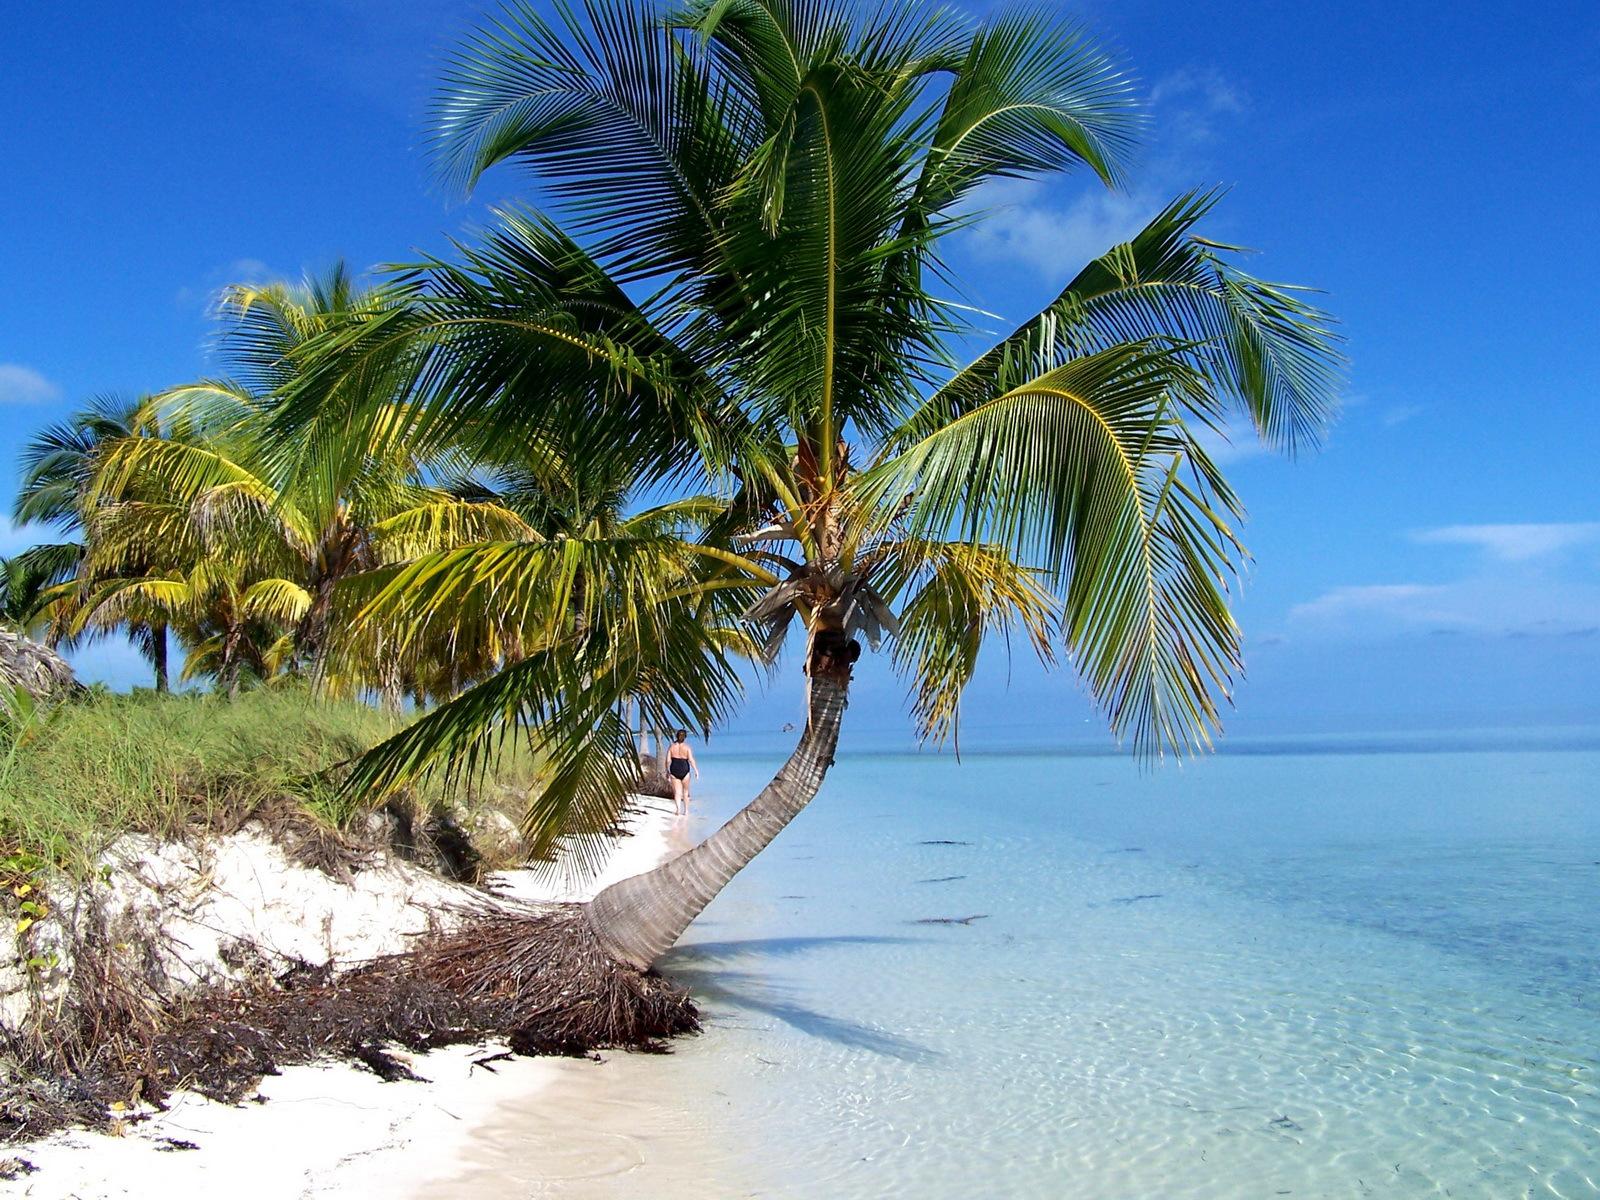 Pilar Beach Cayo Guillermo - Best Beach in Cuba with ...  |Beach Cayo Guillermo Cuba